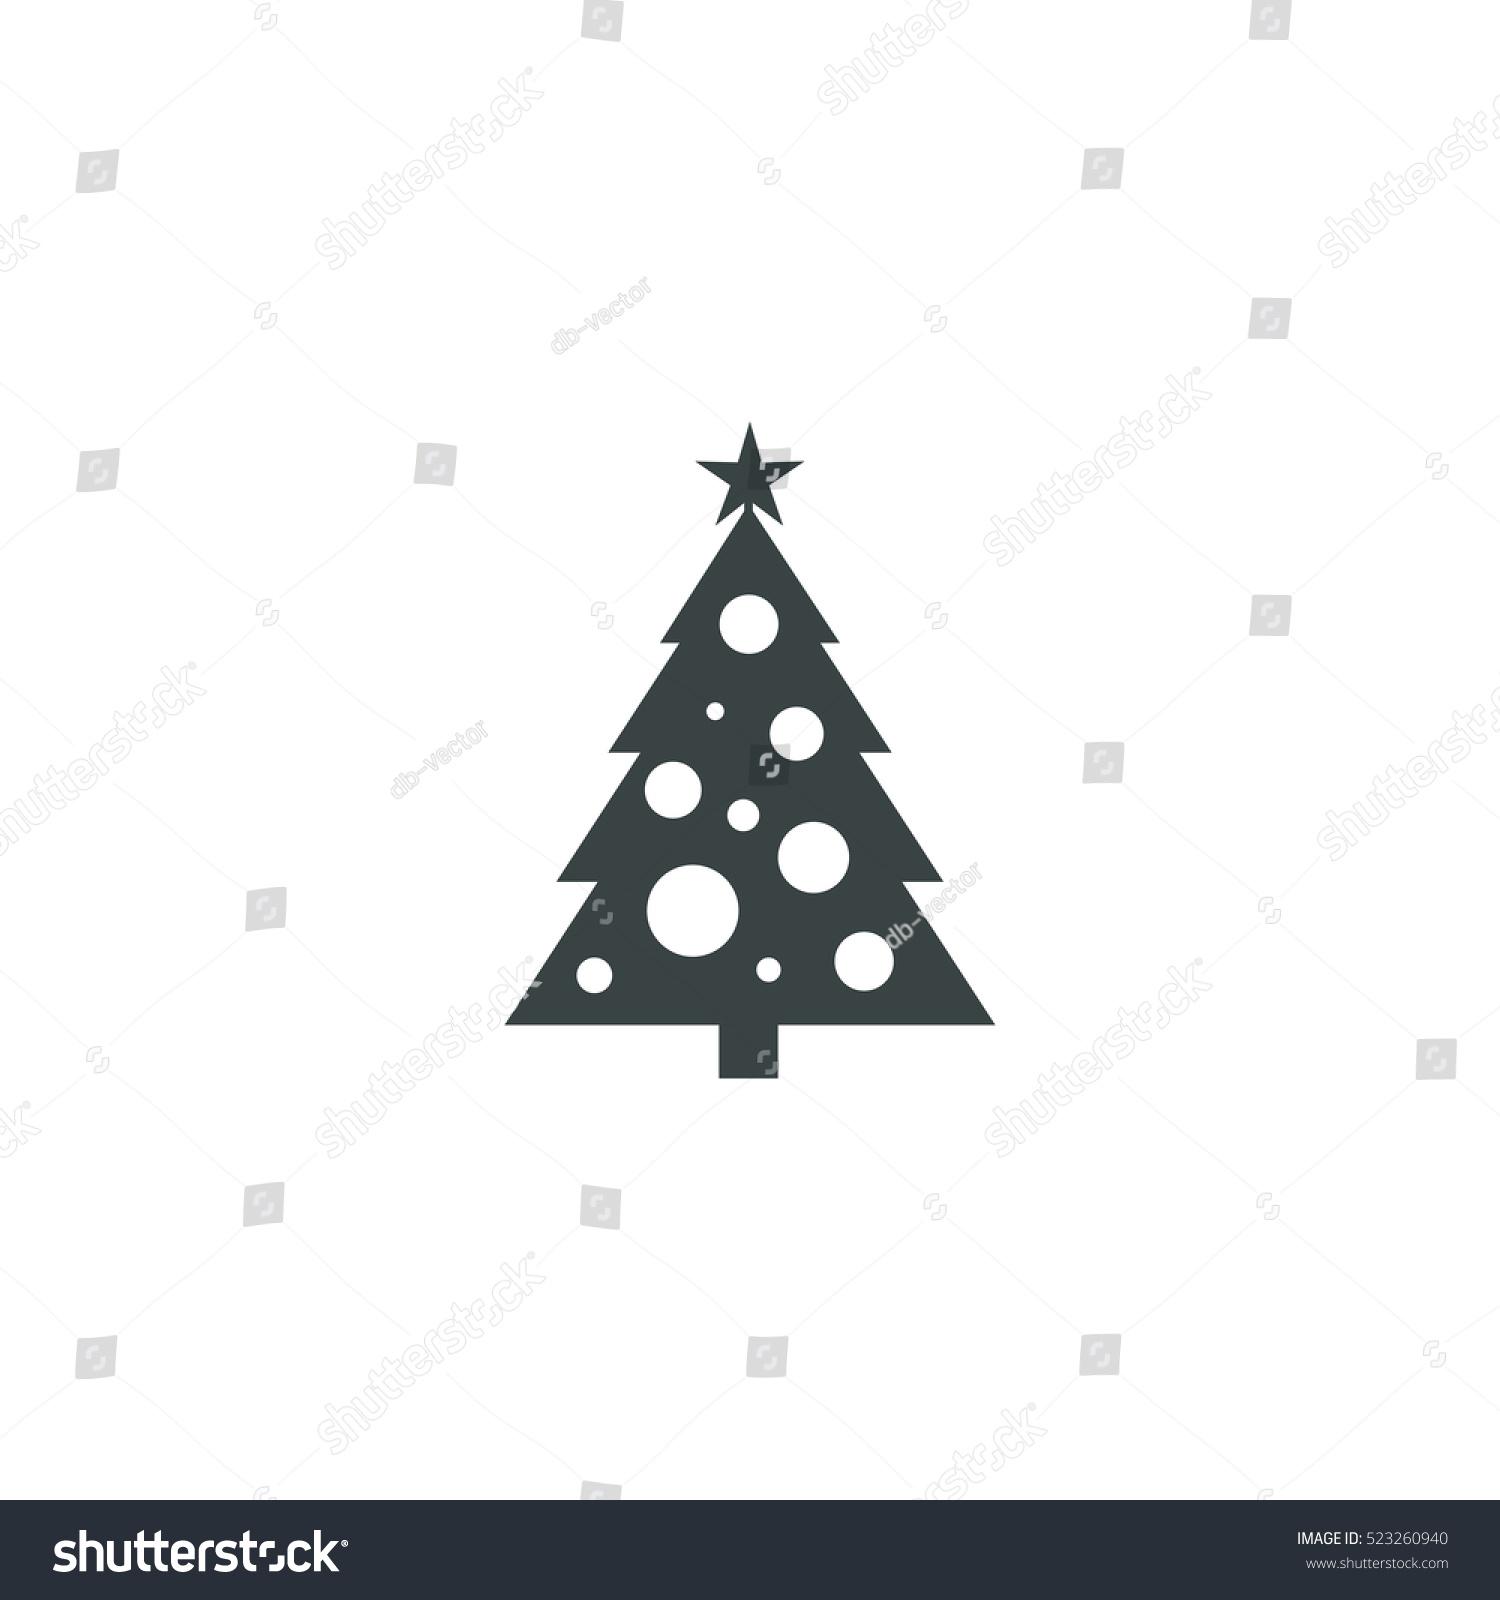 Christmas tree icon simple vector illustration